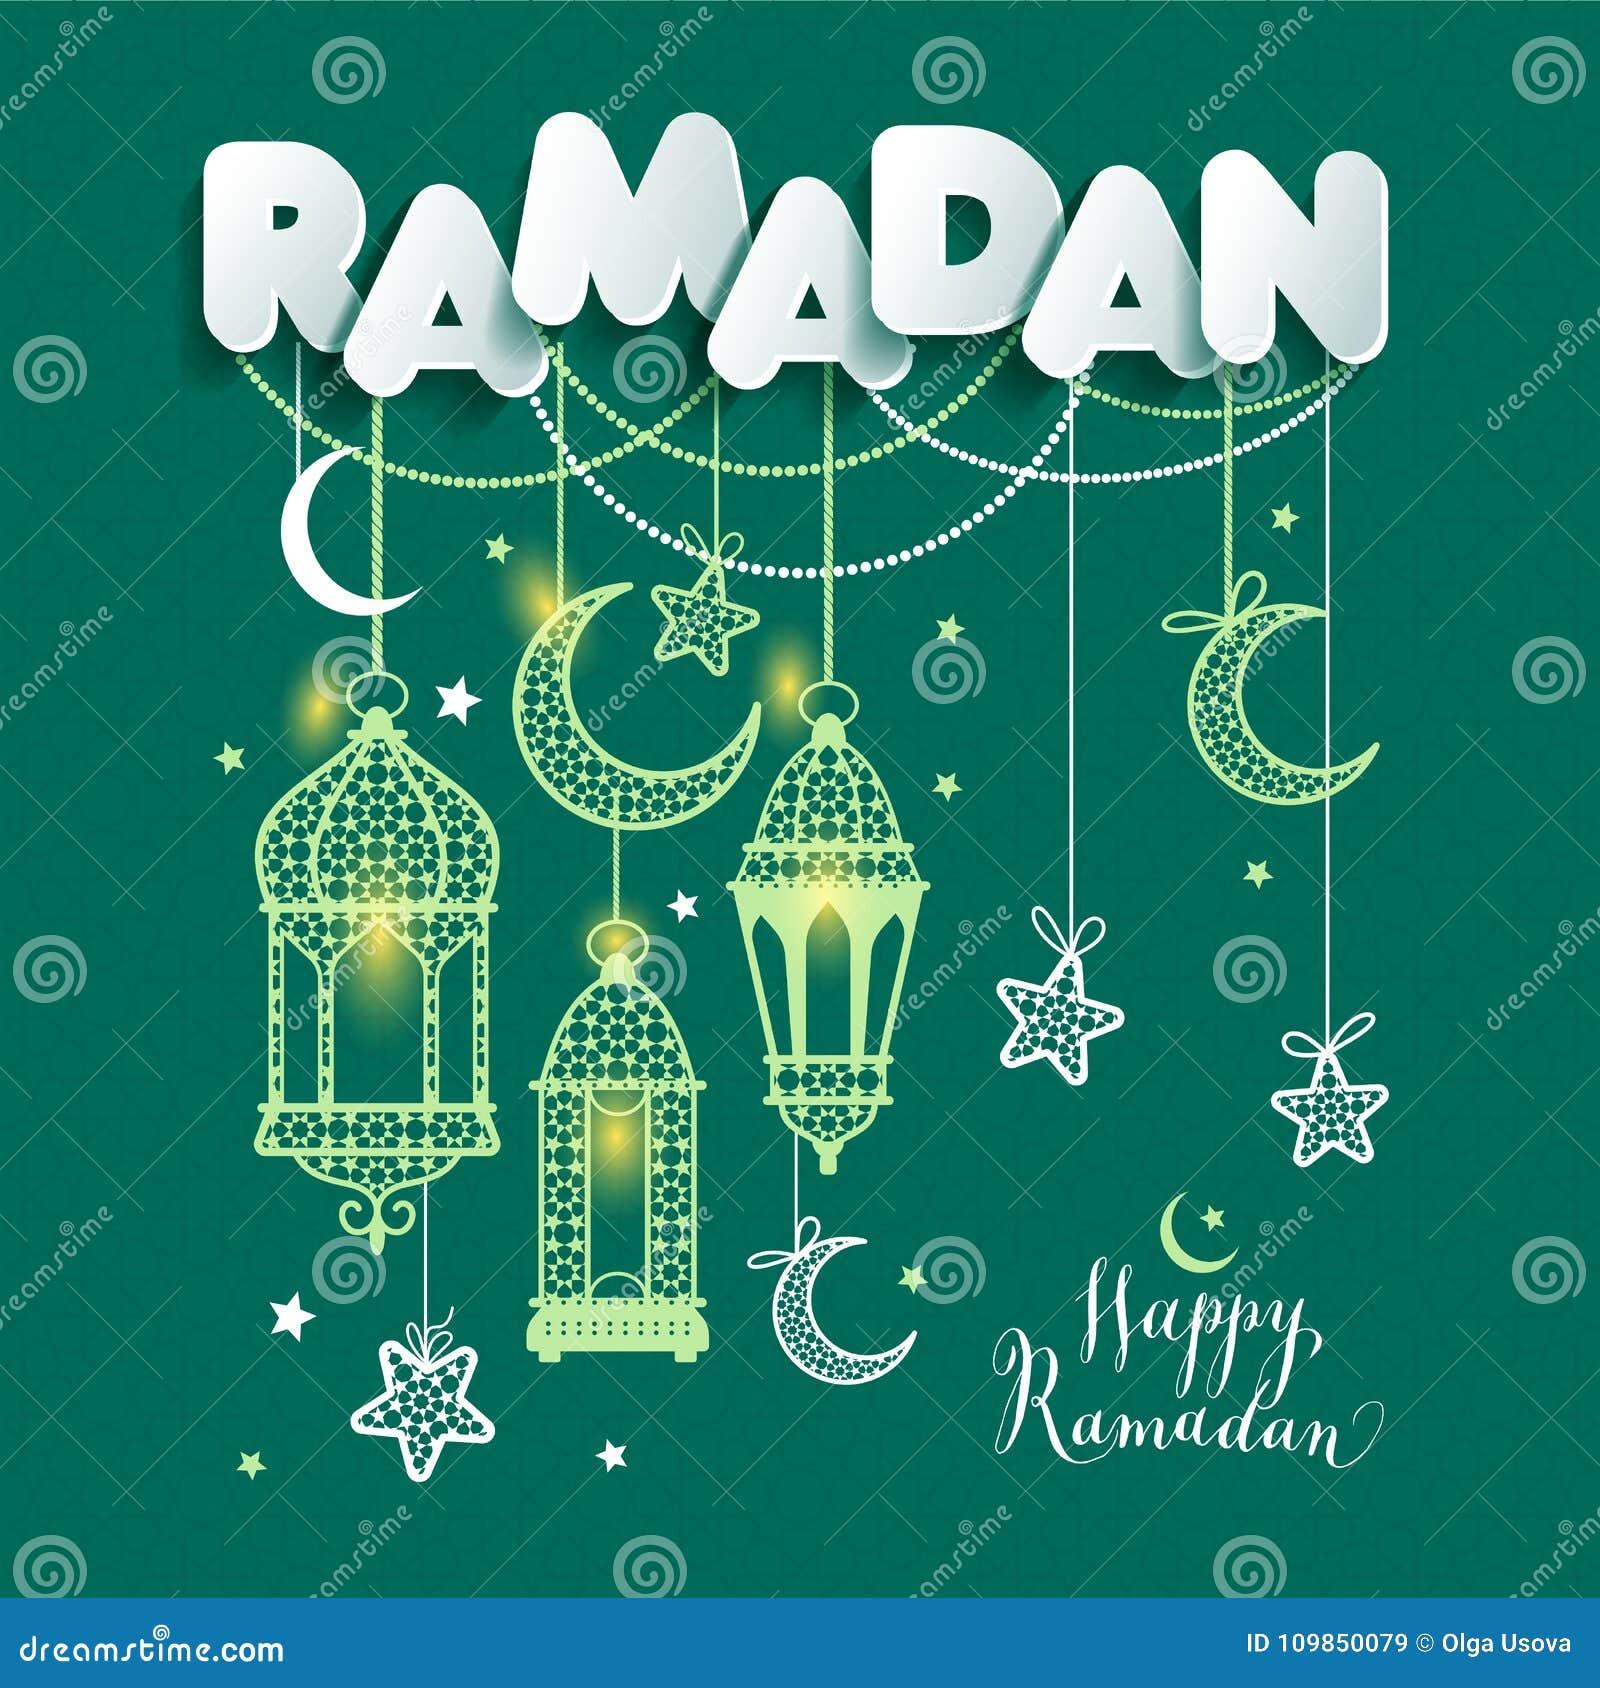 Ramadan Kareem greting illustration av Ramadanberöm